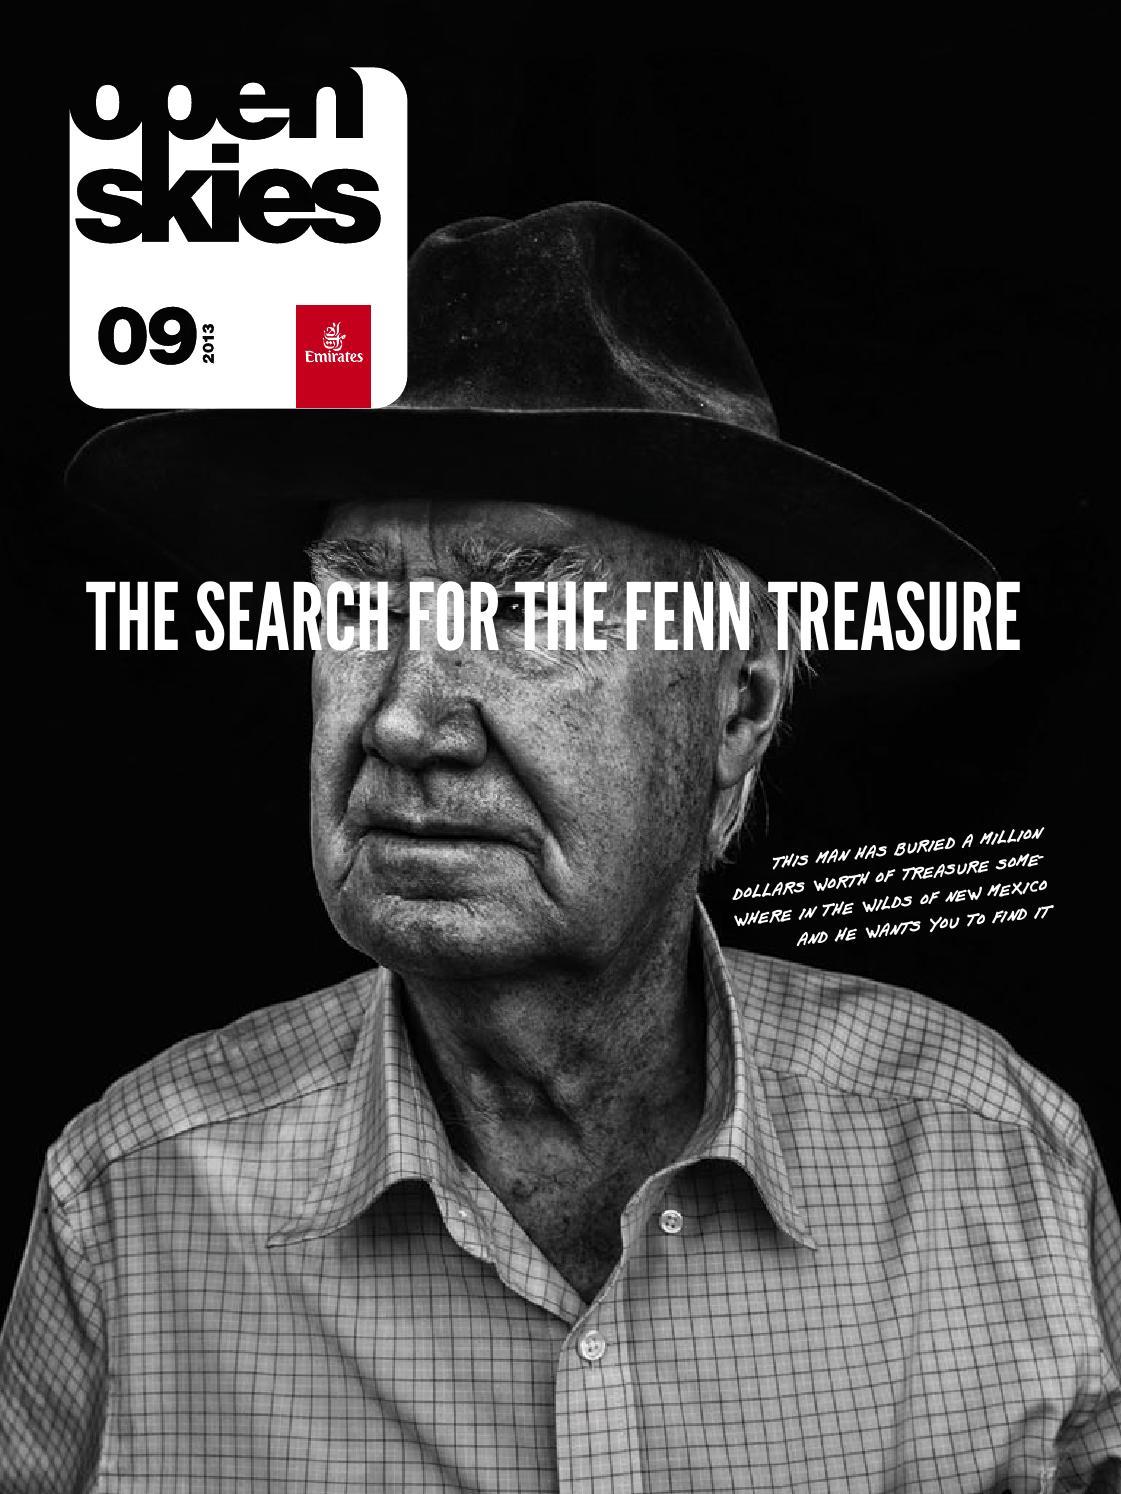 Openskies | September 2013 by Motivate Publishing - issuu